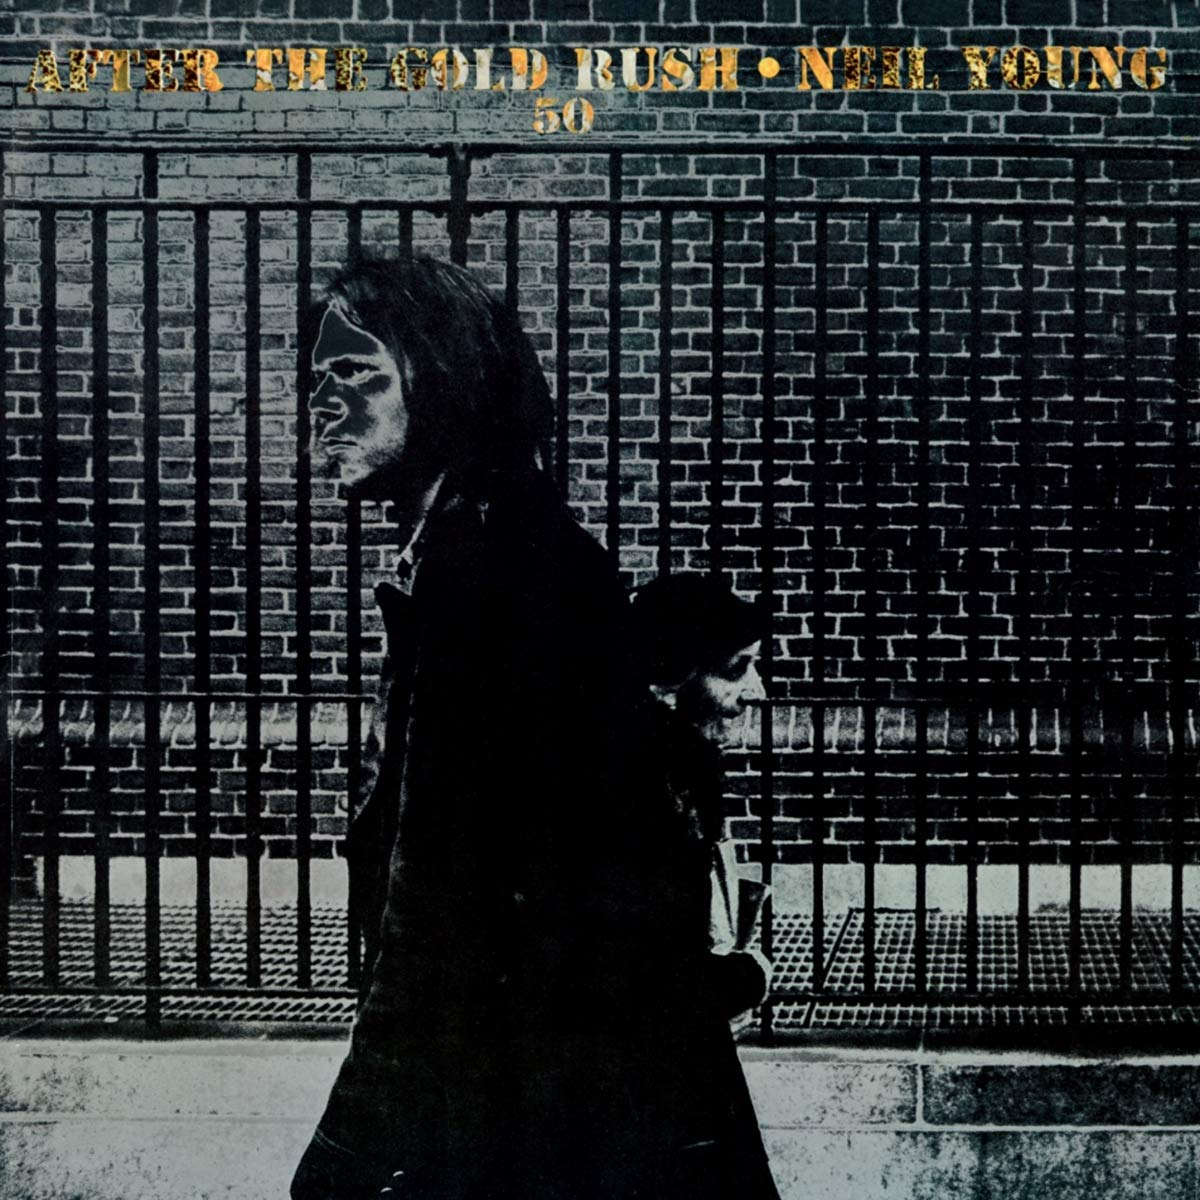 Neil Young - After The Gold Rush (Lp + Single Lp) [Vinilo]